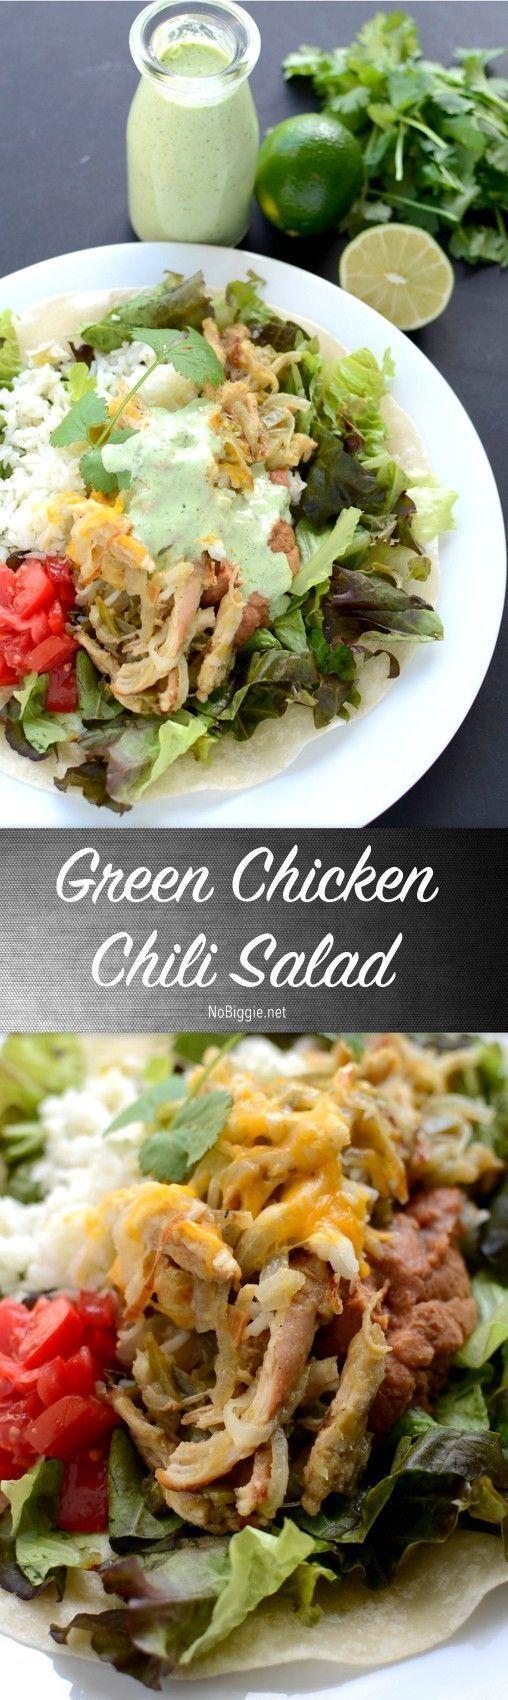 Bajio S Green Chicken Chili Salad Recipe Nobiggie Net Chili Salad Delicious Salads Green Chili Chicken